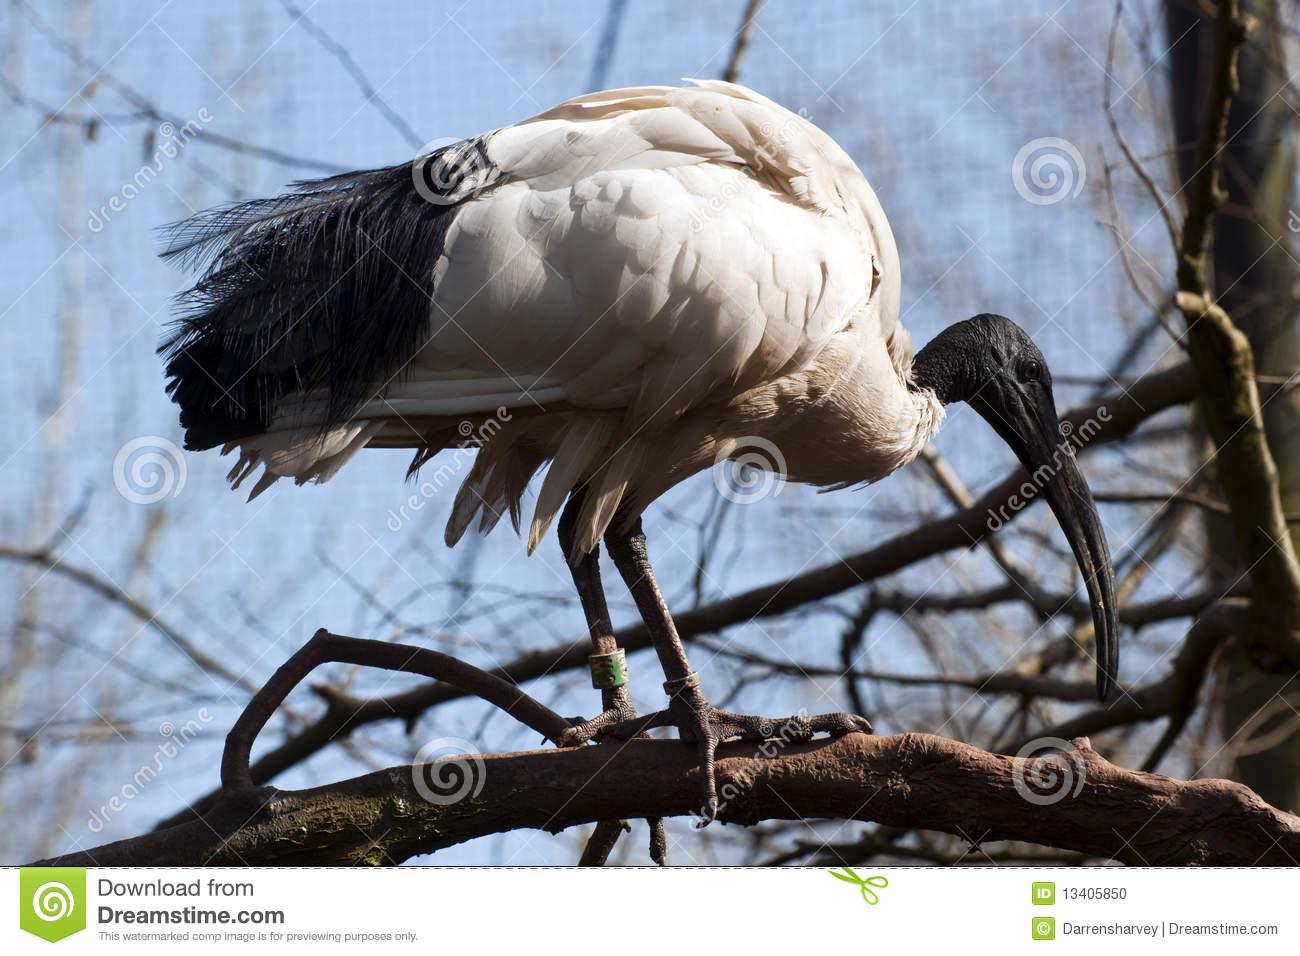 Ugly Bird With A Very Long Beak.